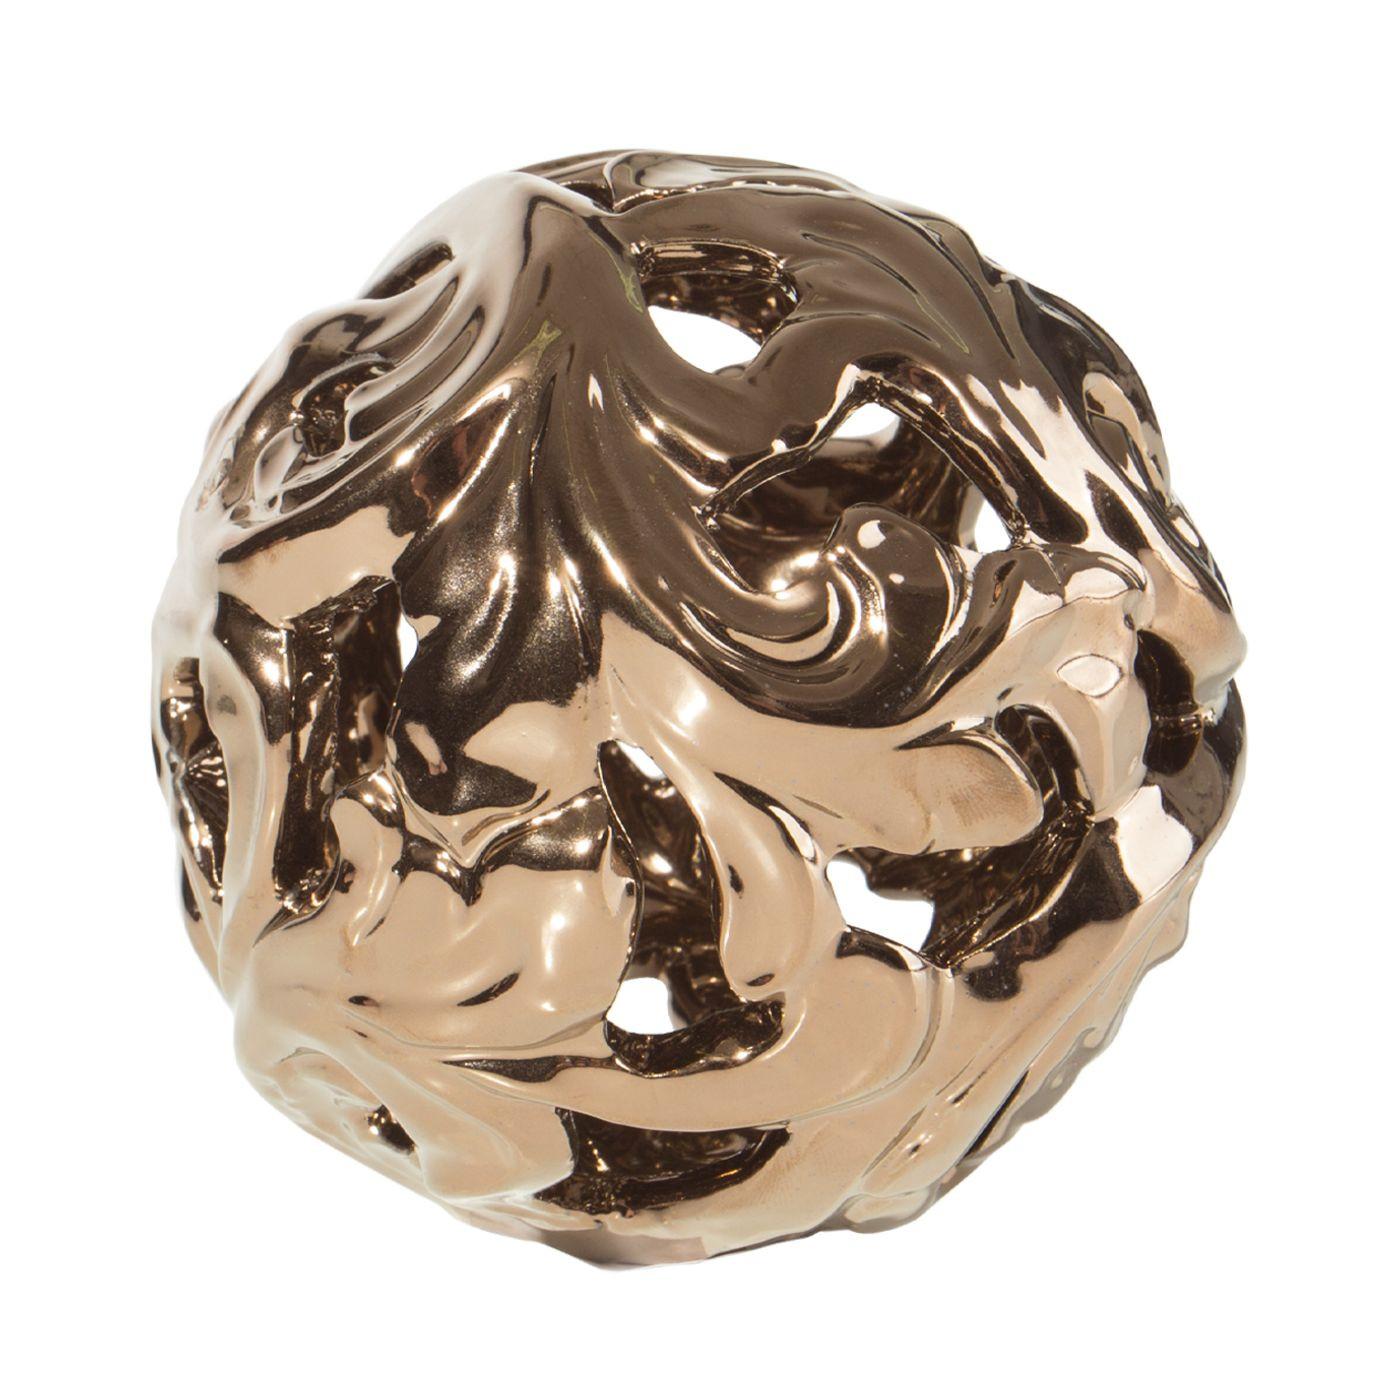 Kula ceramiczna ażurowa stare złoto 11 cm